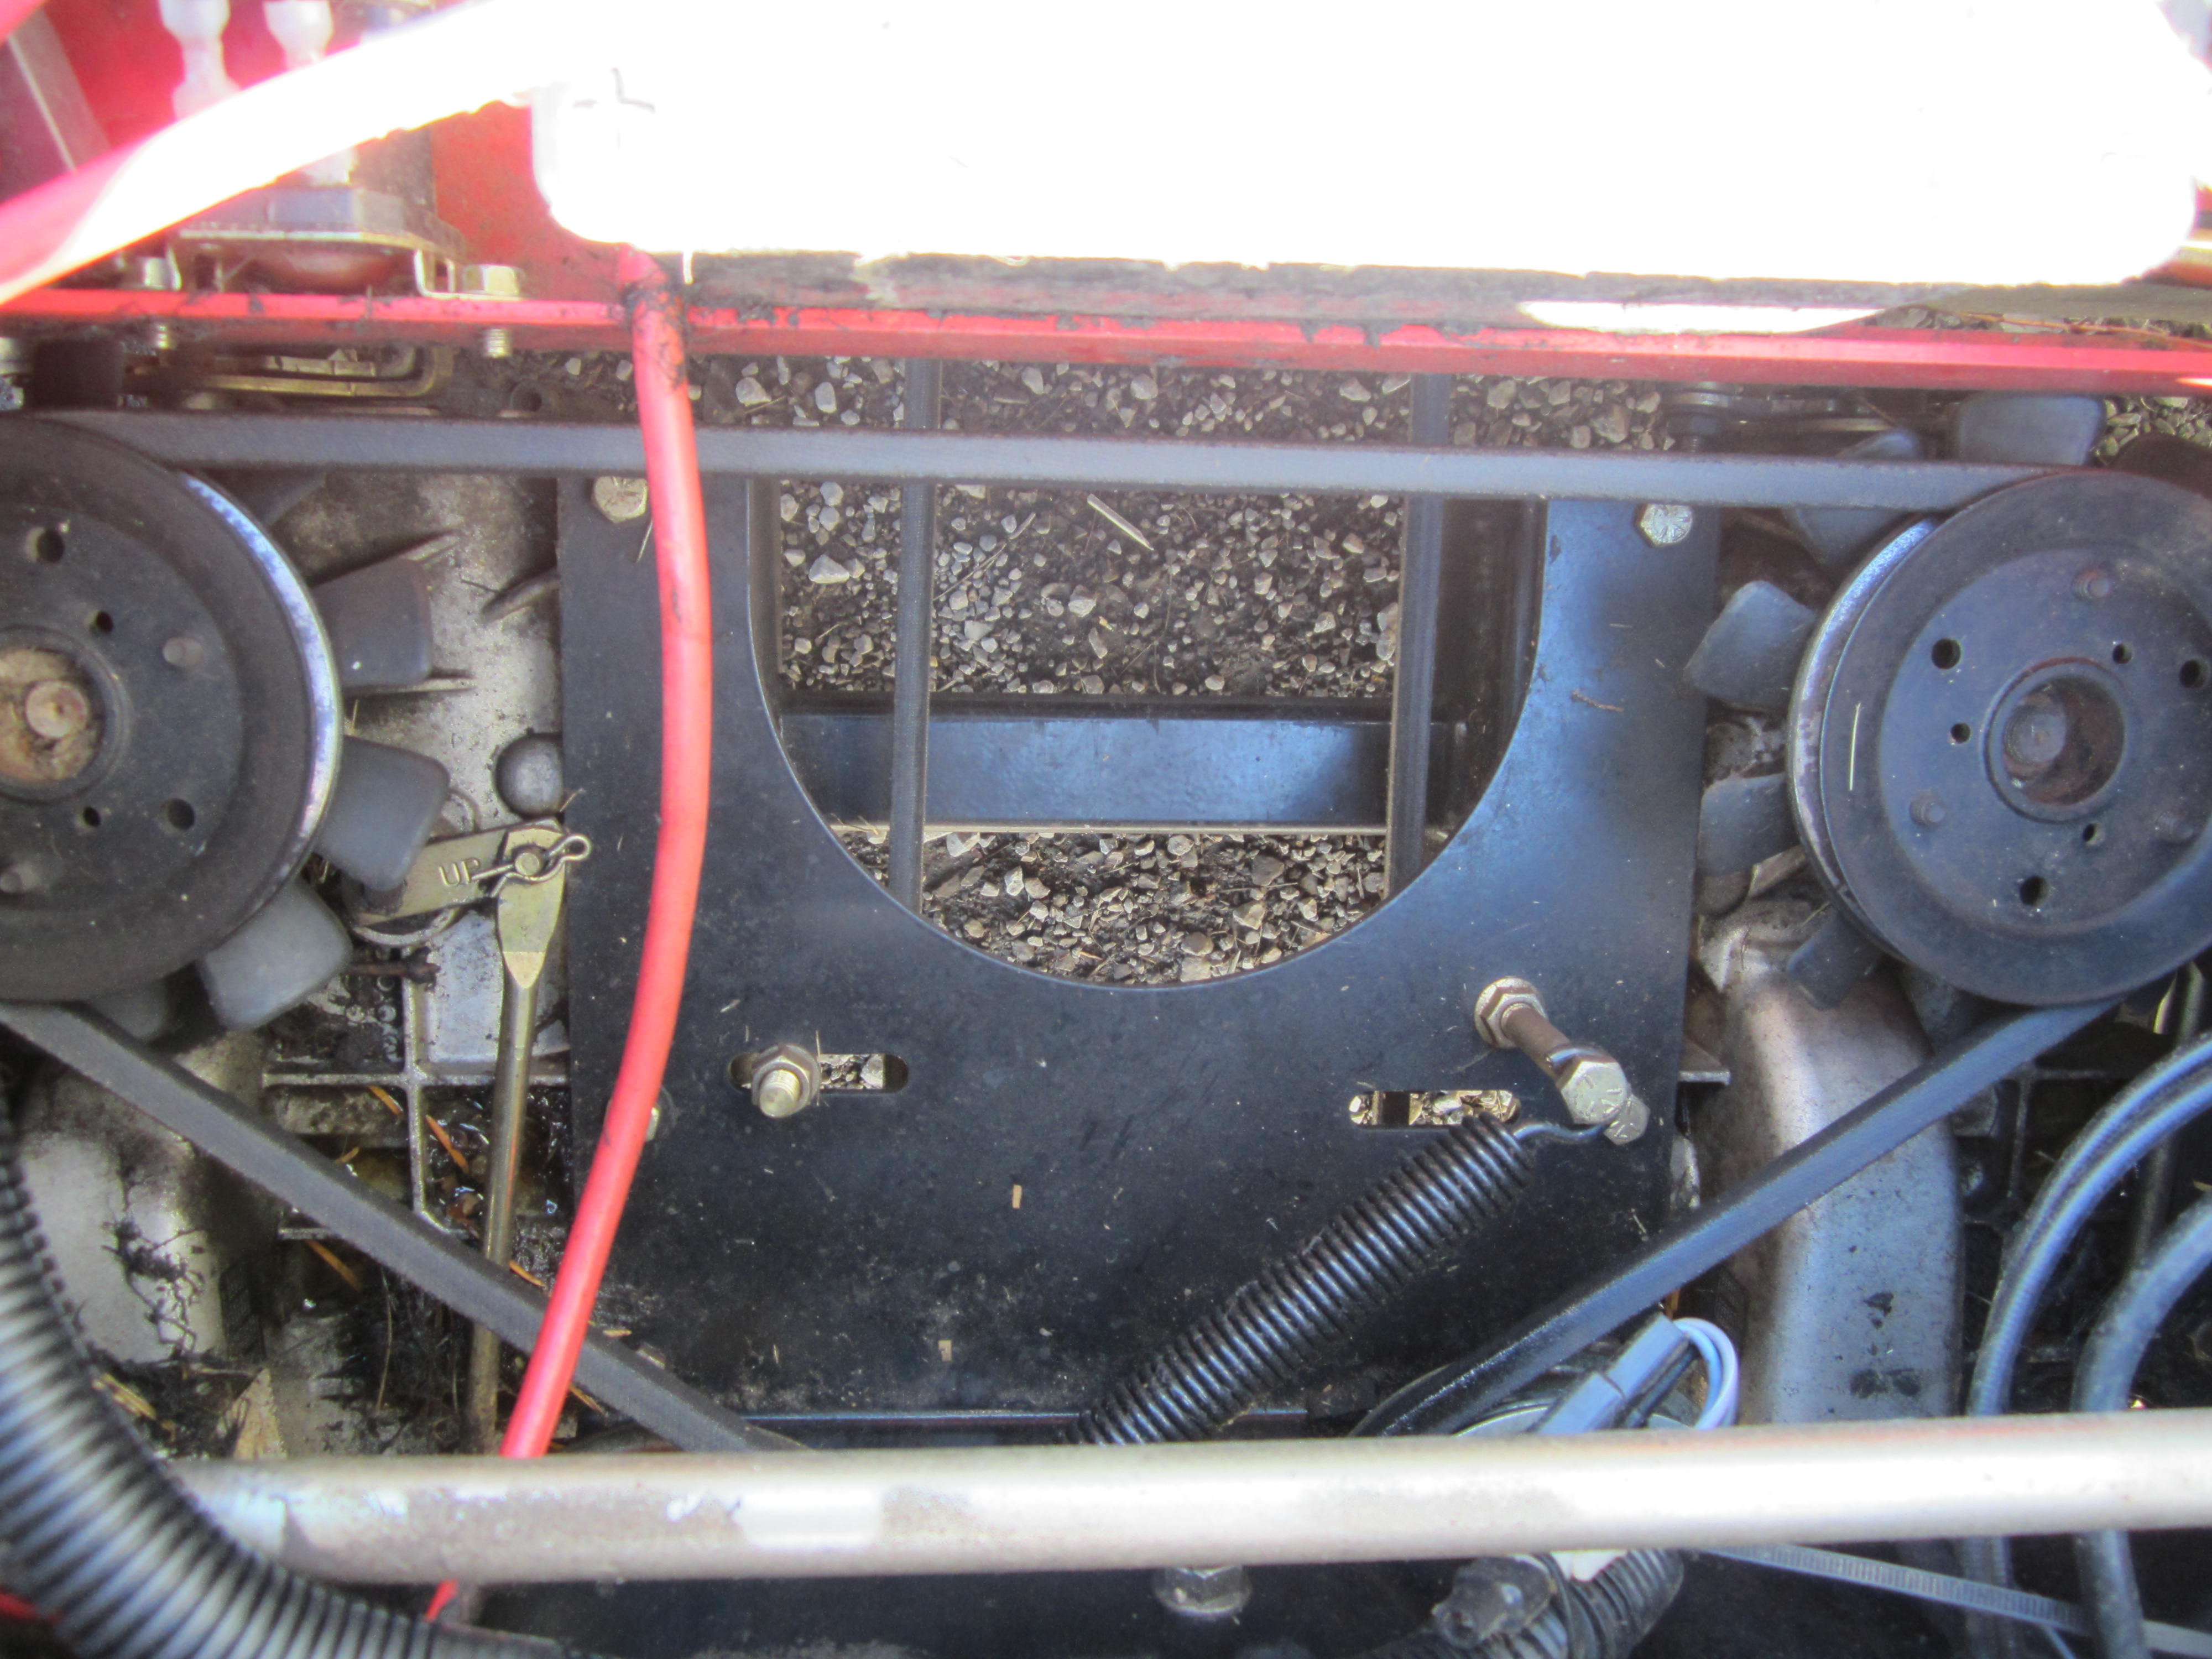 belt diagram gravely engine image for user manual ariens belt pulley diagram ariens engine image for user manual